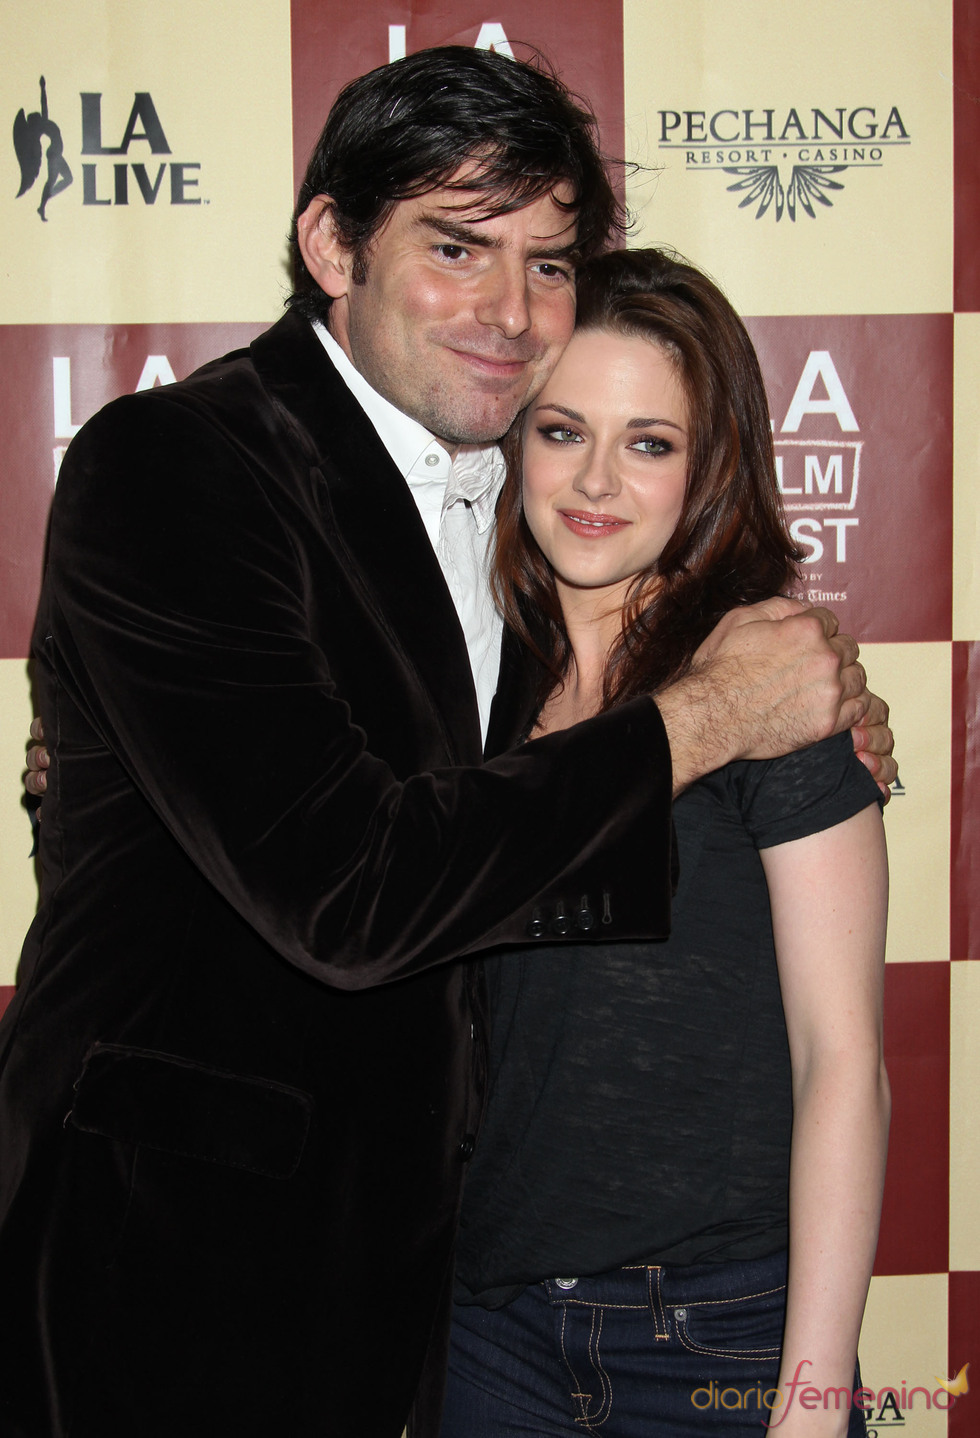 Chris Weitz abraza a Kristen Stewart en la premier de 'A Better Life'